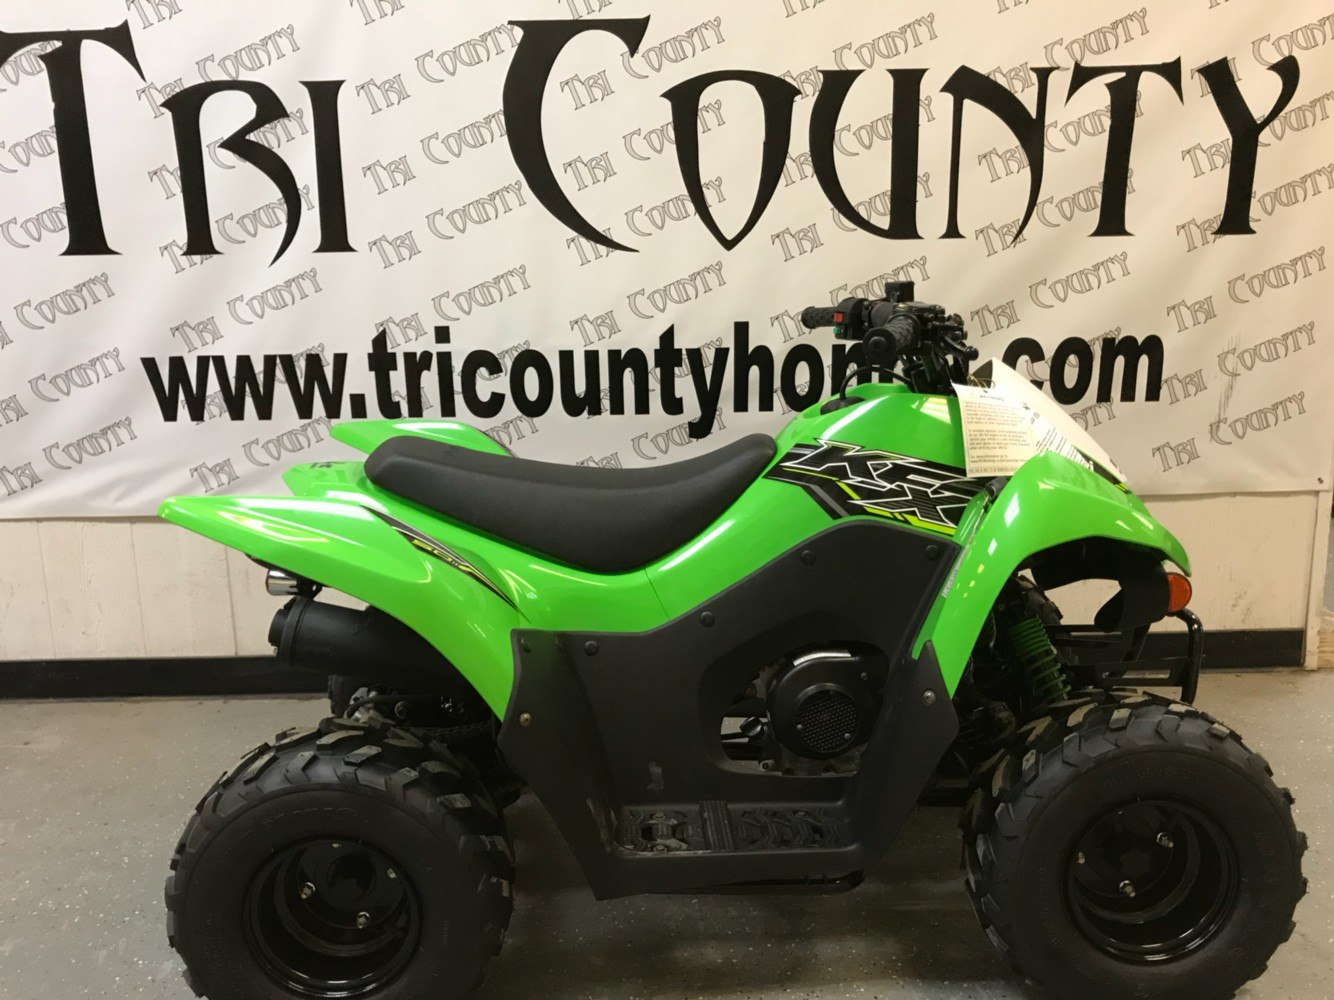 2019 Kawasaki KFX 50 in Petersburg, West Virginia